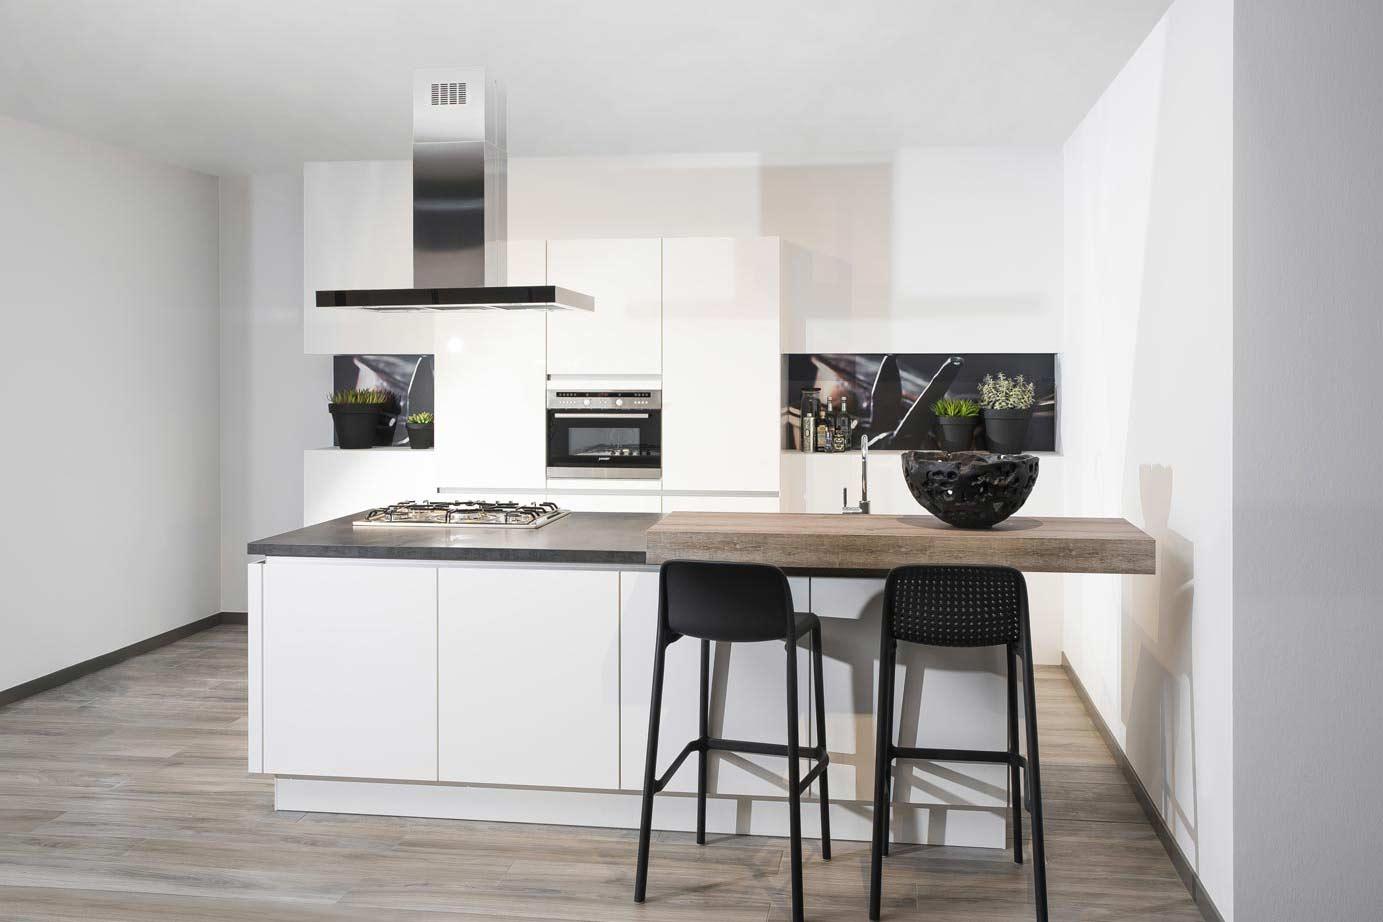 Keukeneiland T Vorm : Een keukeneiland of kookeiland bekijk keukens db keukens